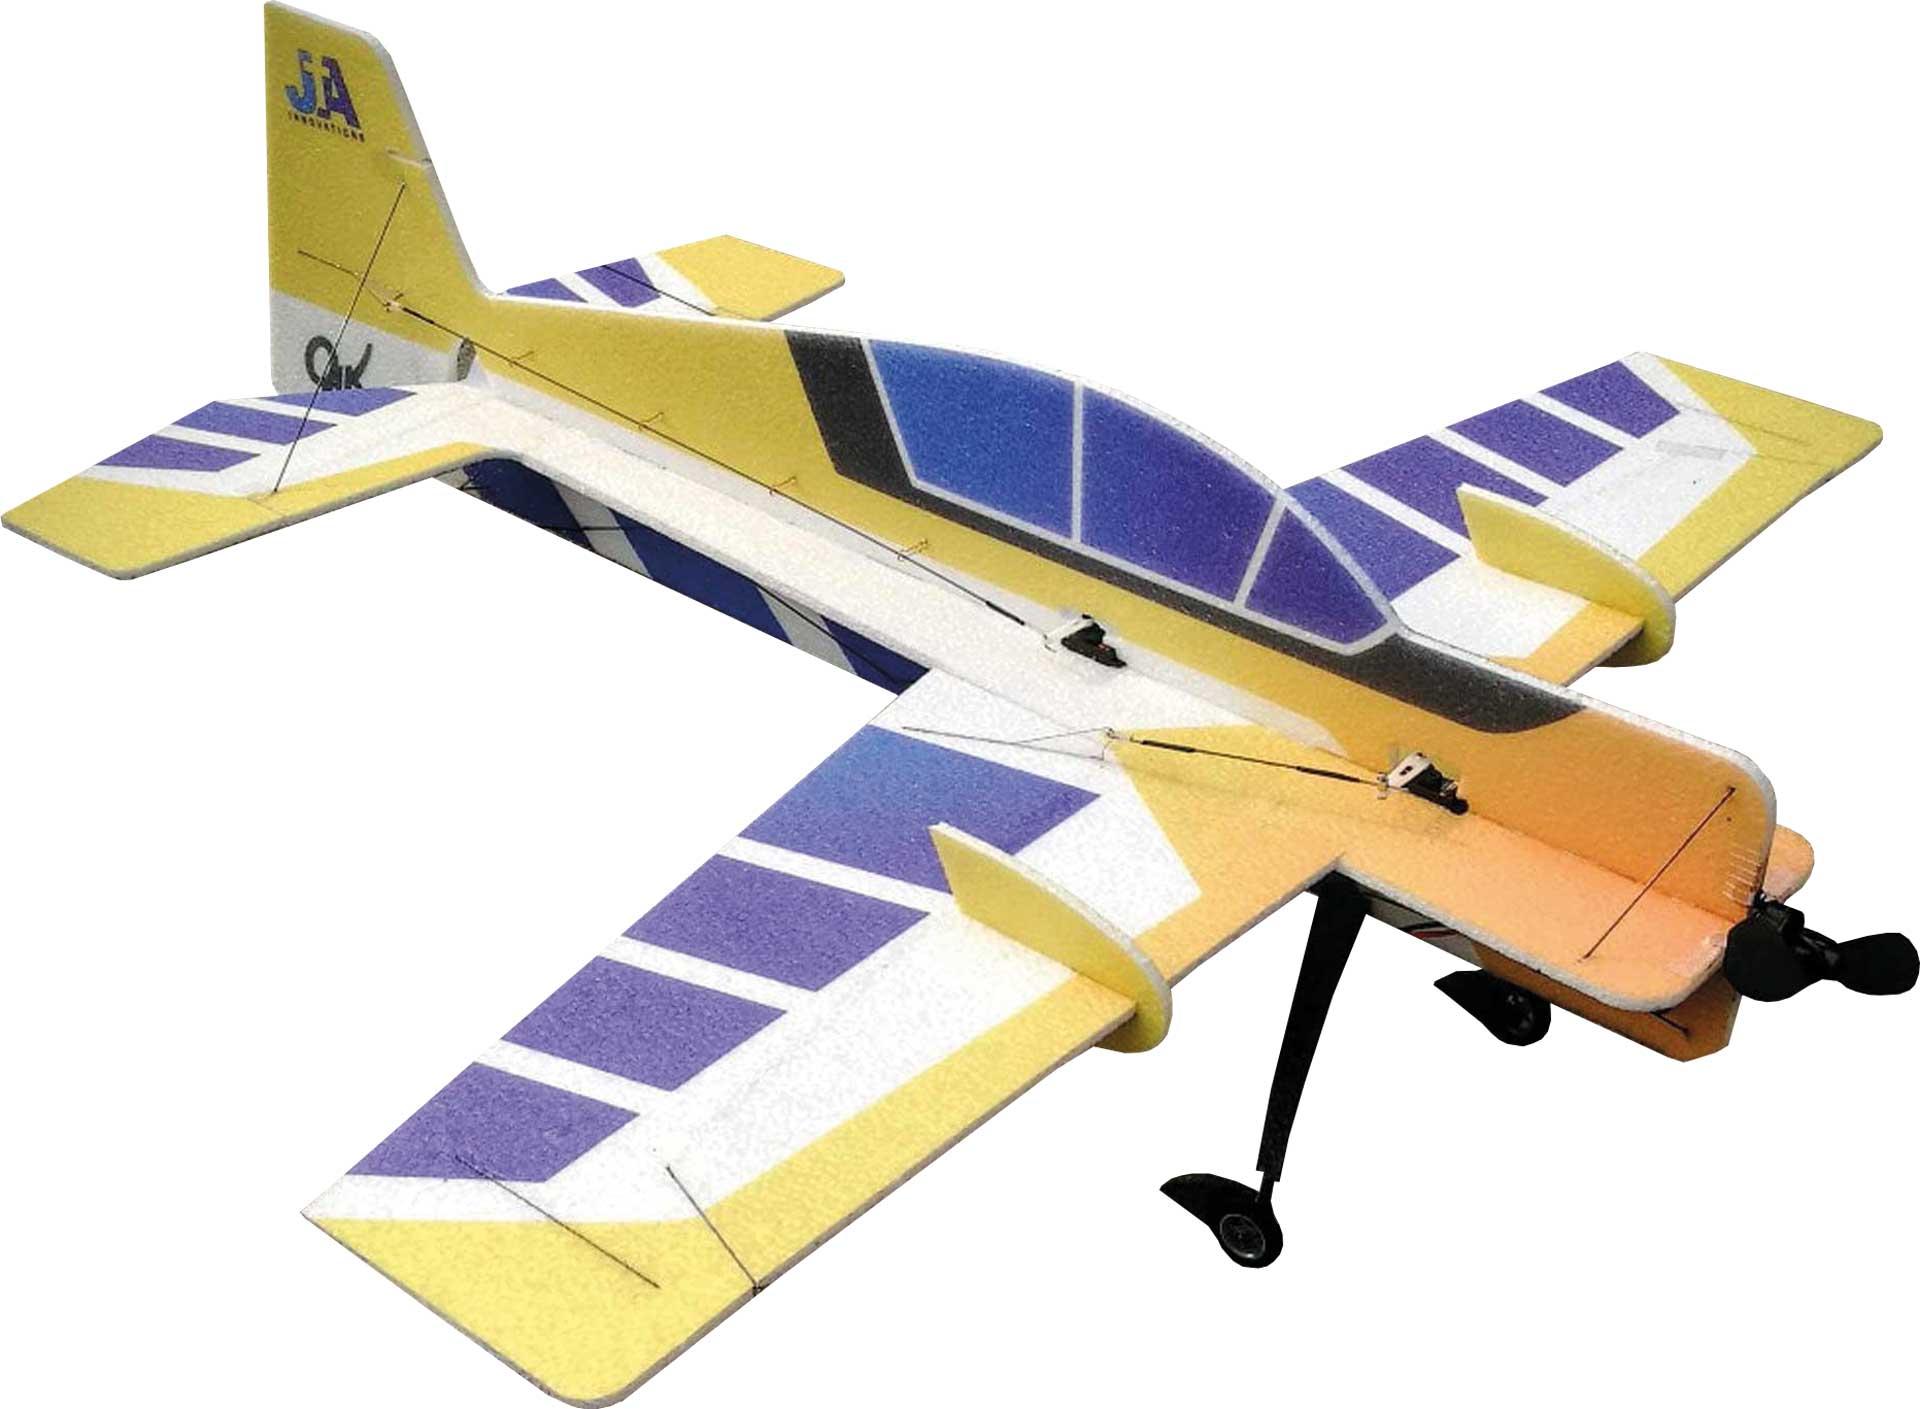 "JTA Innovations Yak 54 (gelb/blau) 32"" EPP 3D-Kunstflug Modell"